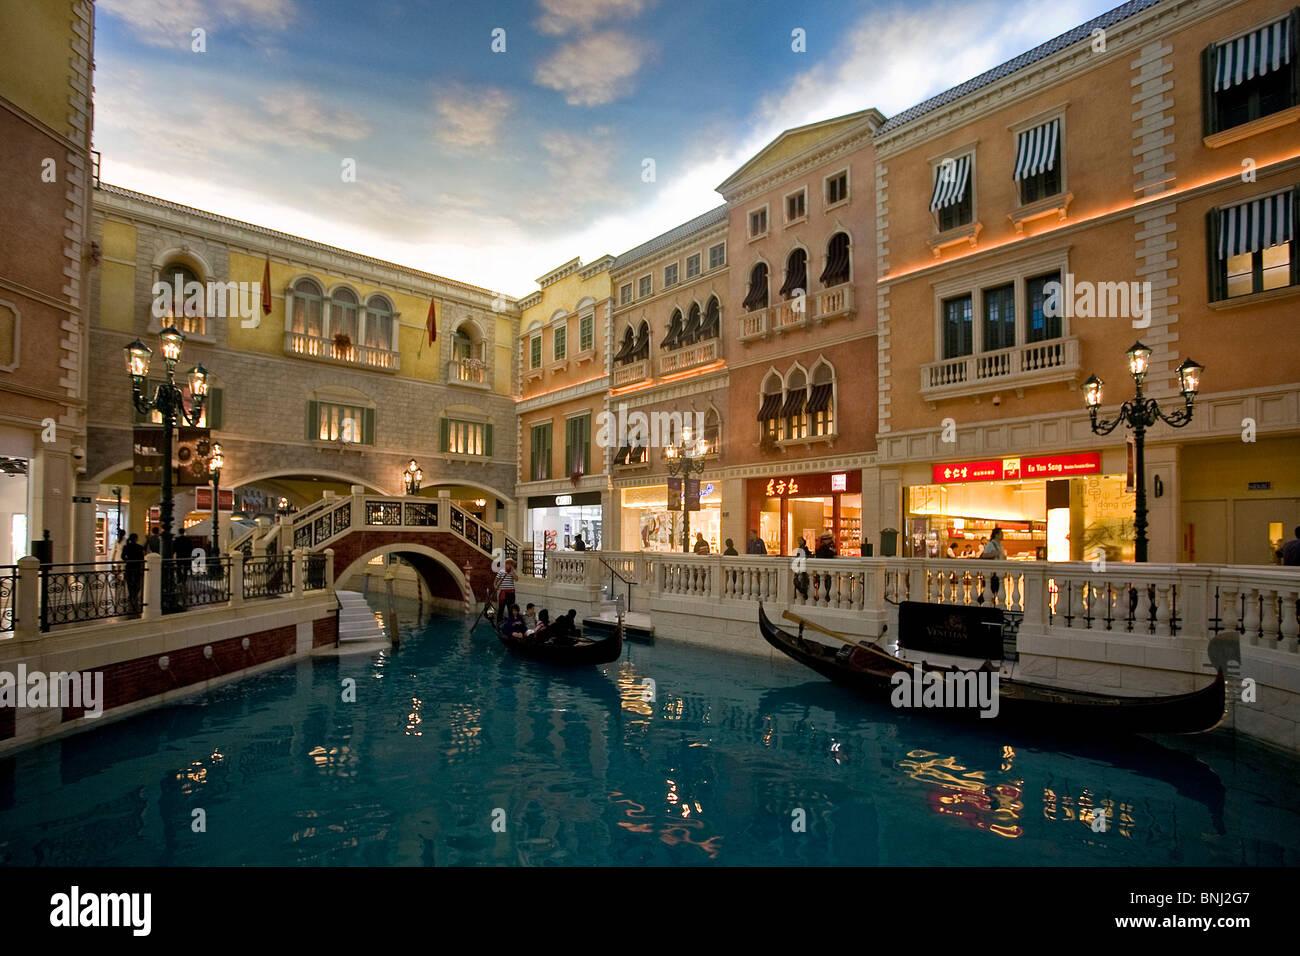 China Macao Macau city Venetian casino casino Venice simulation canal channel bridge gondolas - Stock Image